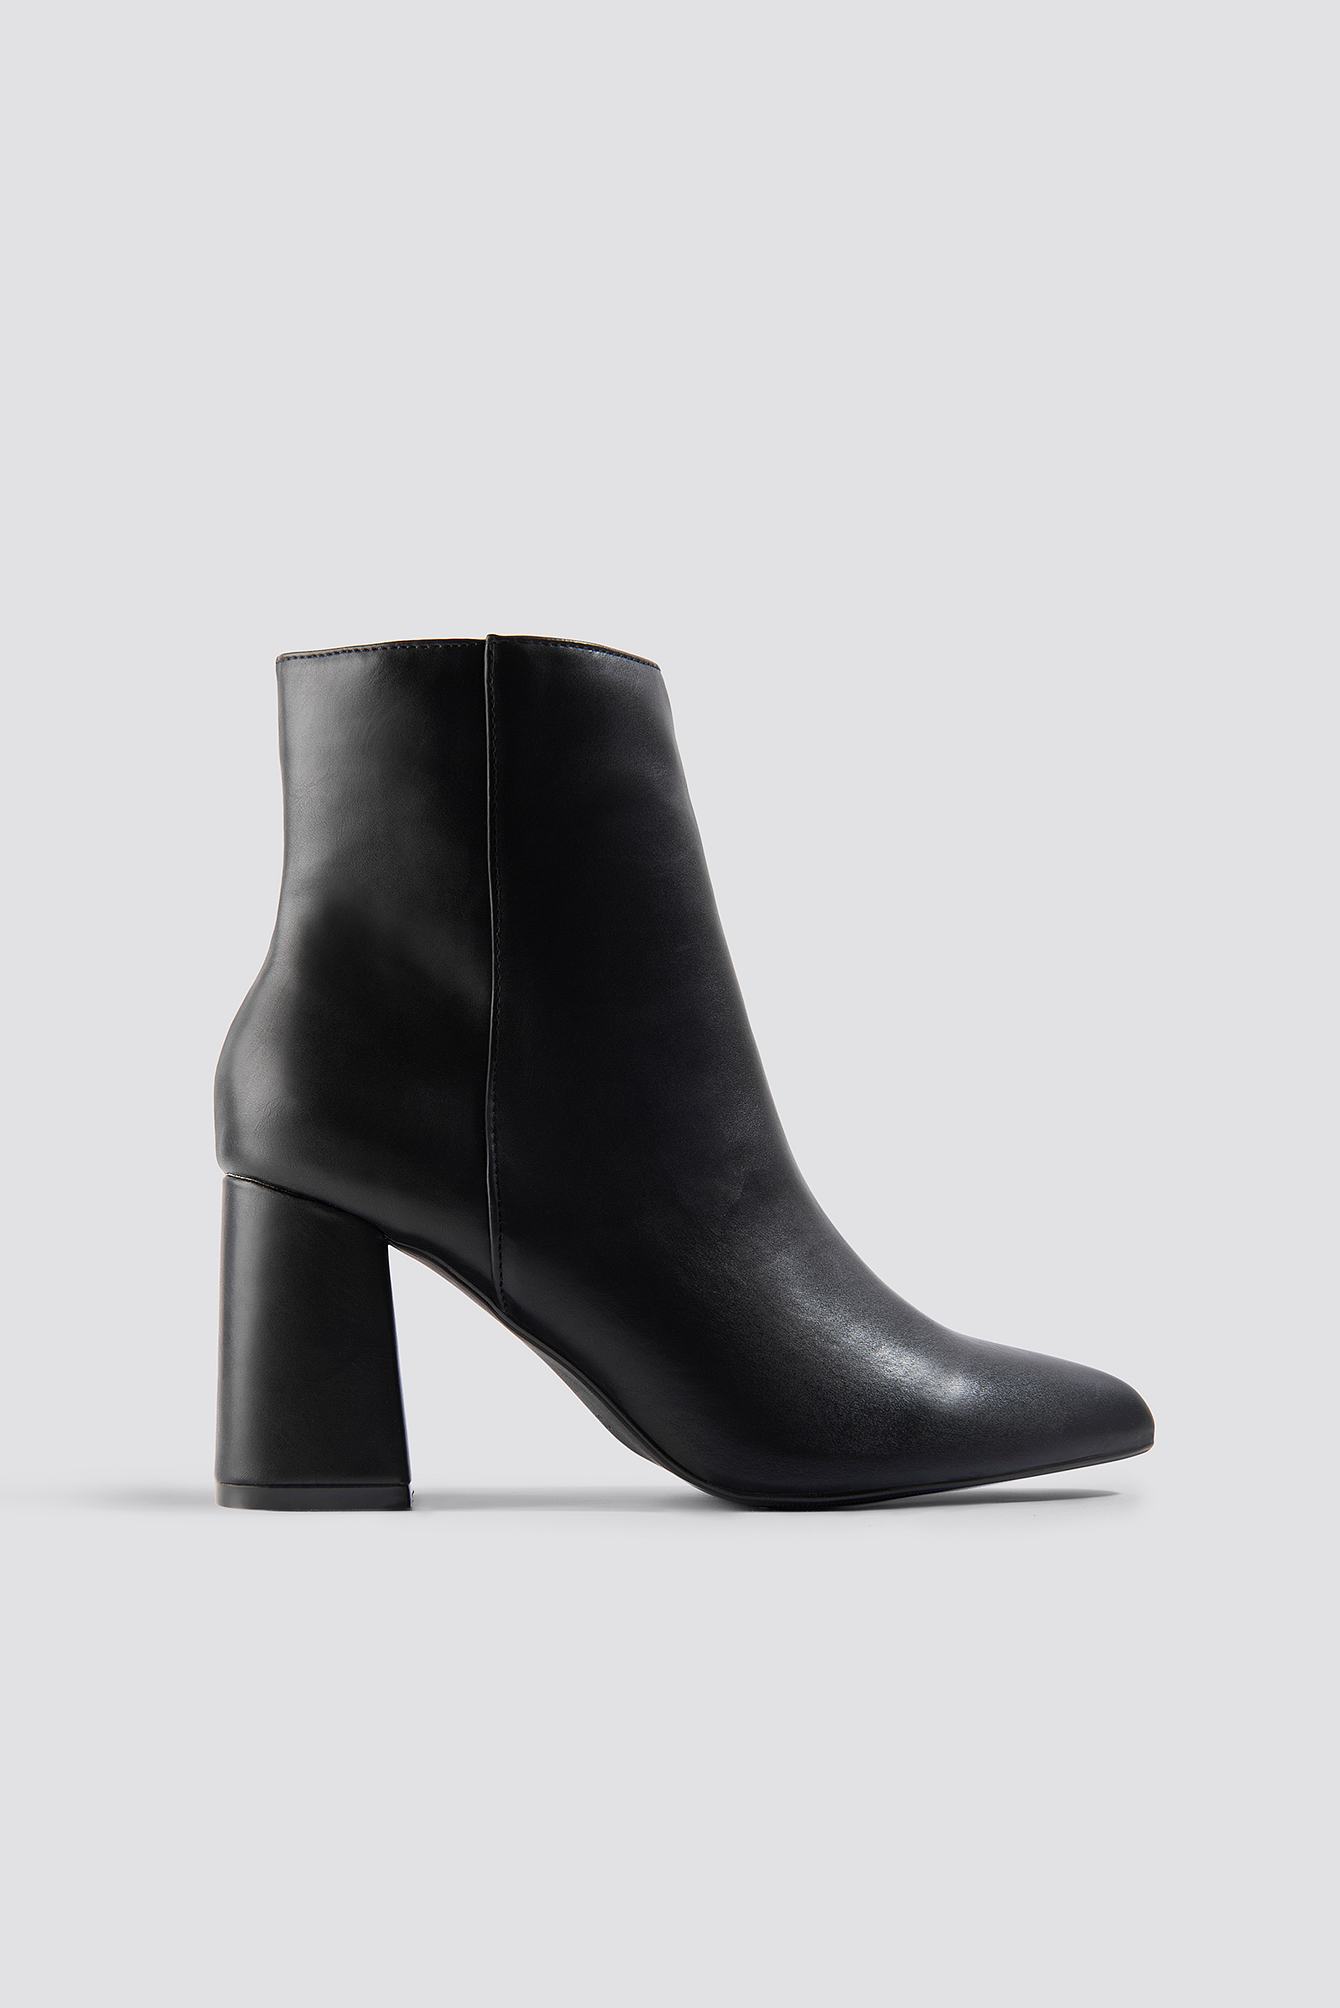 Basic Block Heel Booties Black | na-kd.com